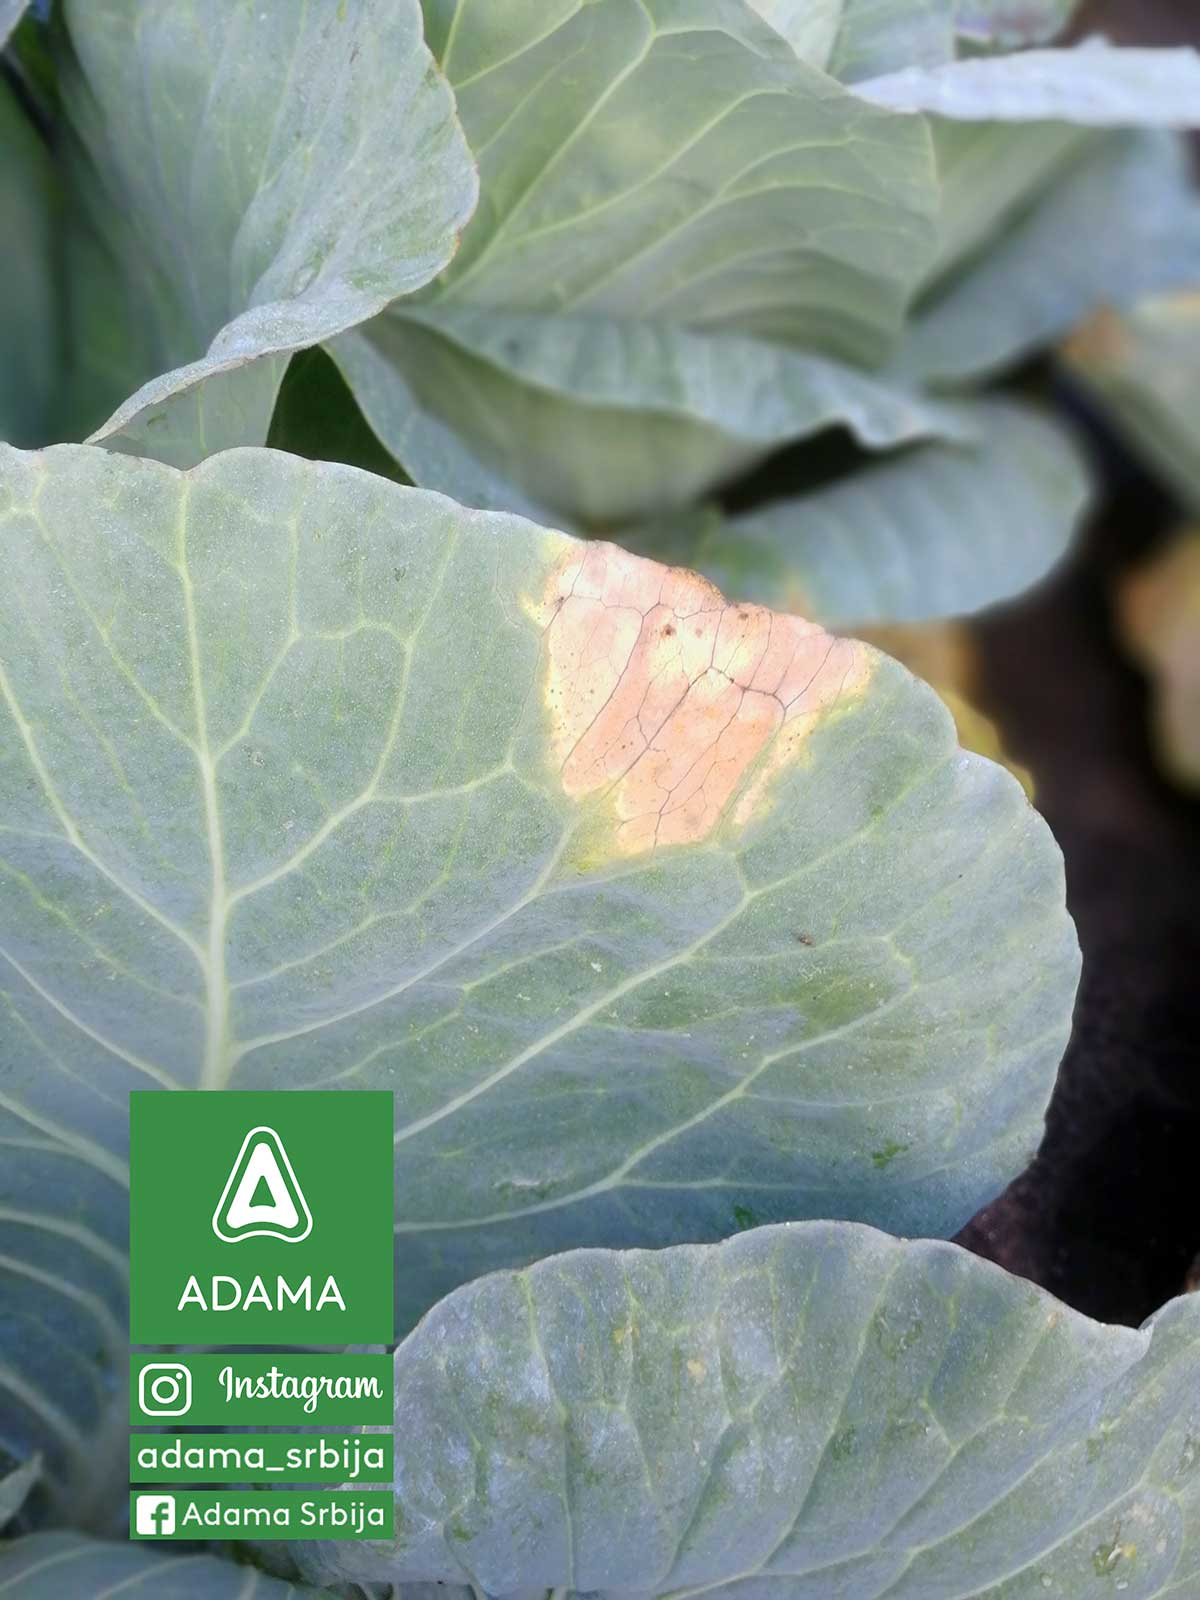 Agrosaveti---Adama---Povce---Kupus---Kupusnjace---Crna-trulez-03